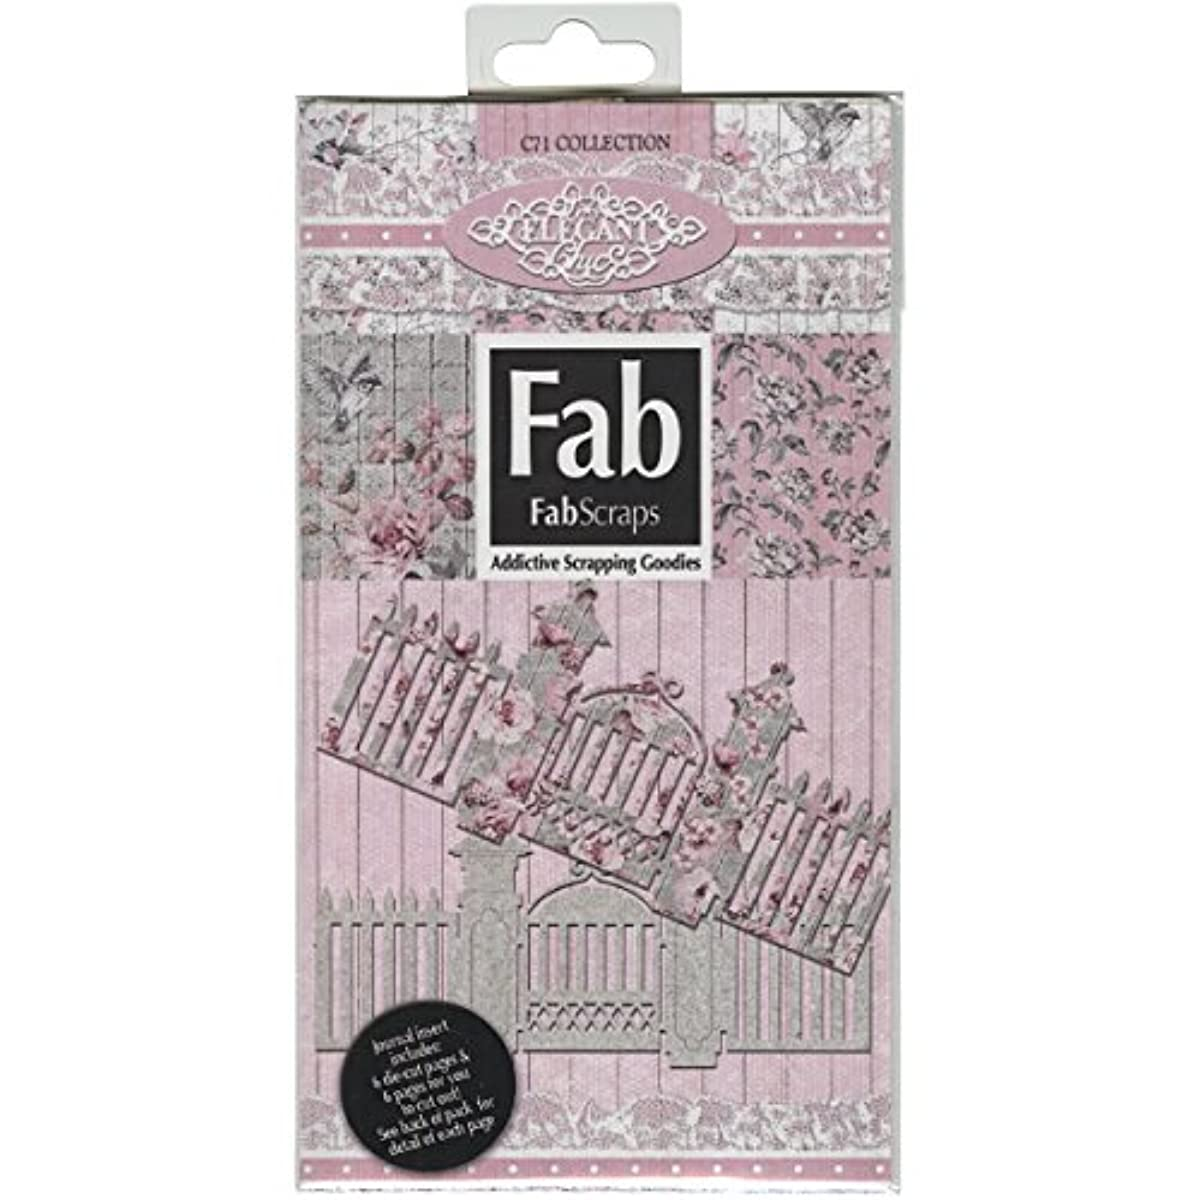 FabScraps Elegant Chic Journal Pack